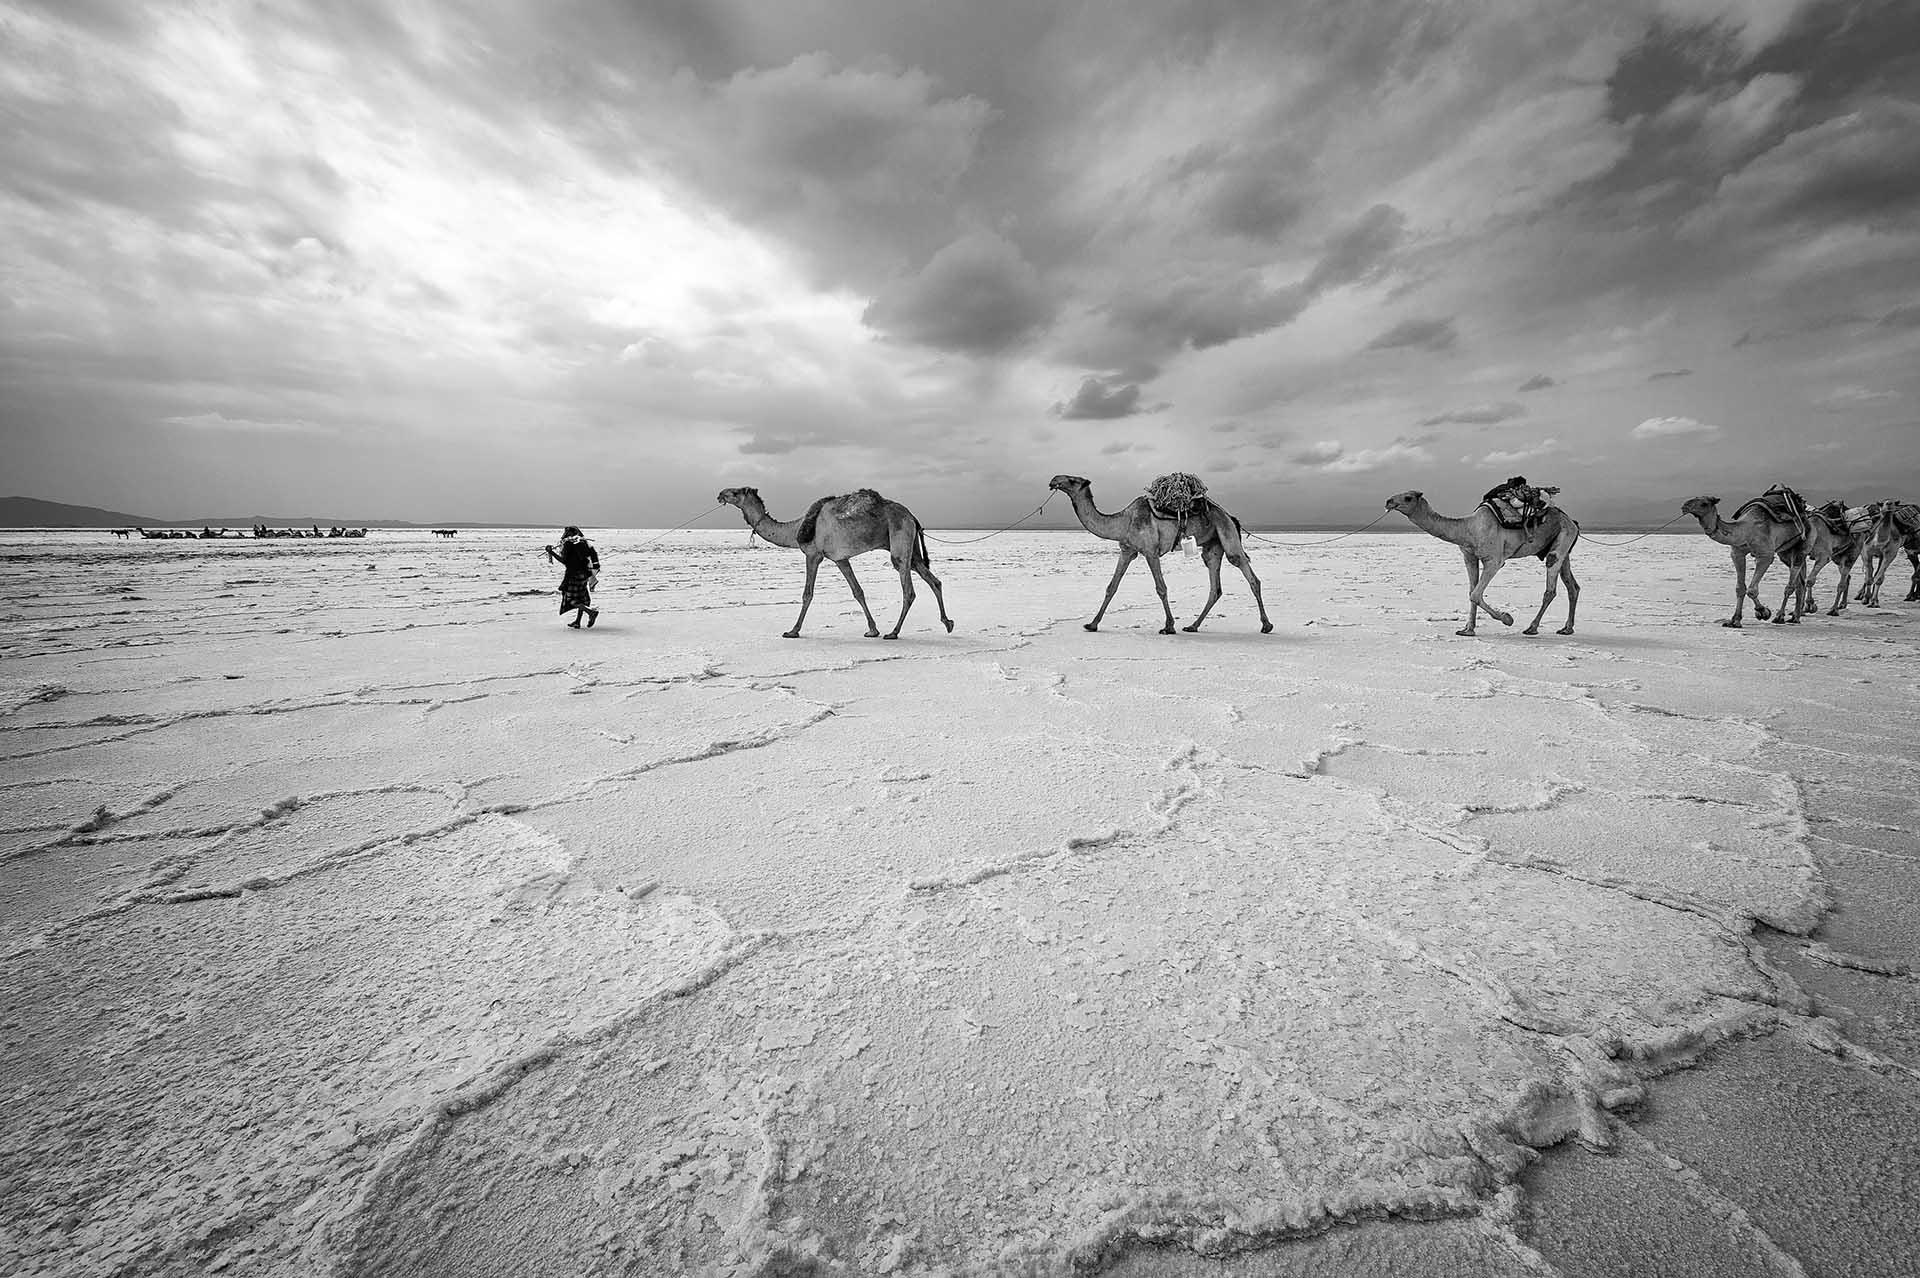 ethiopië-lake-asale-afar-zout-caravaan